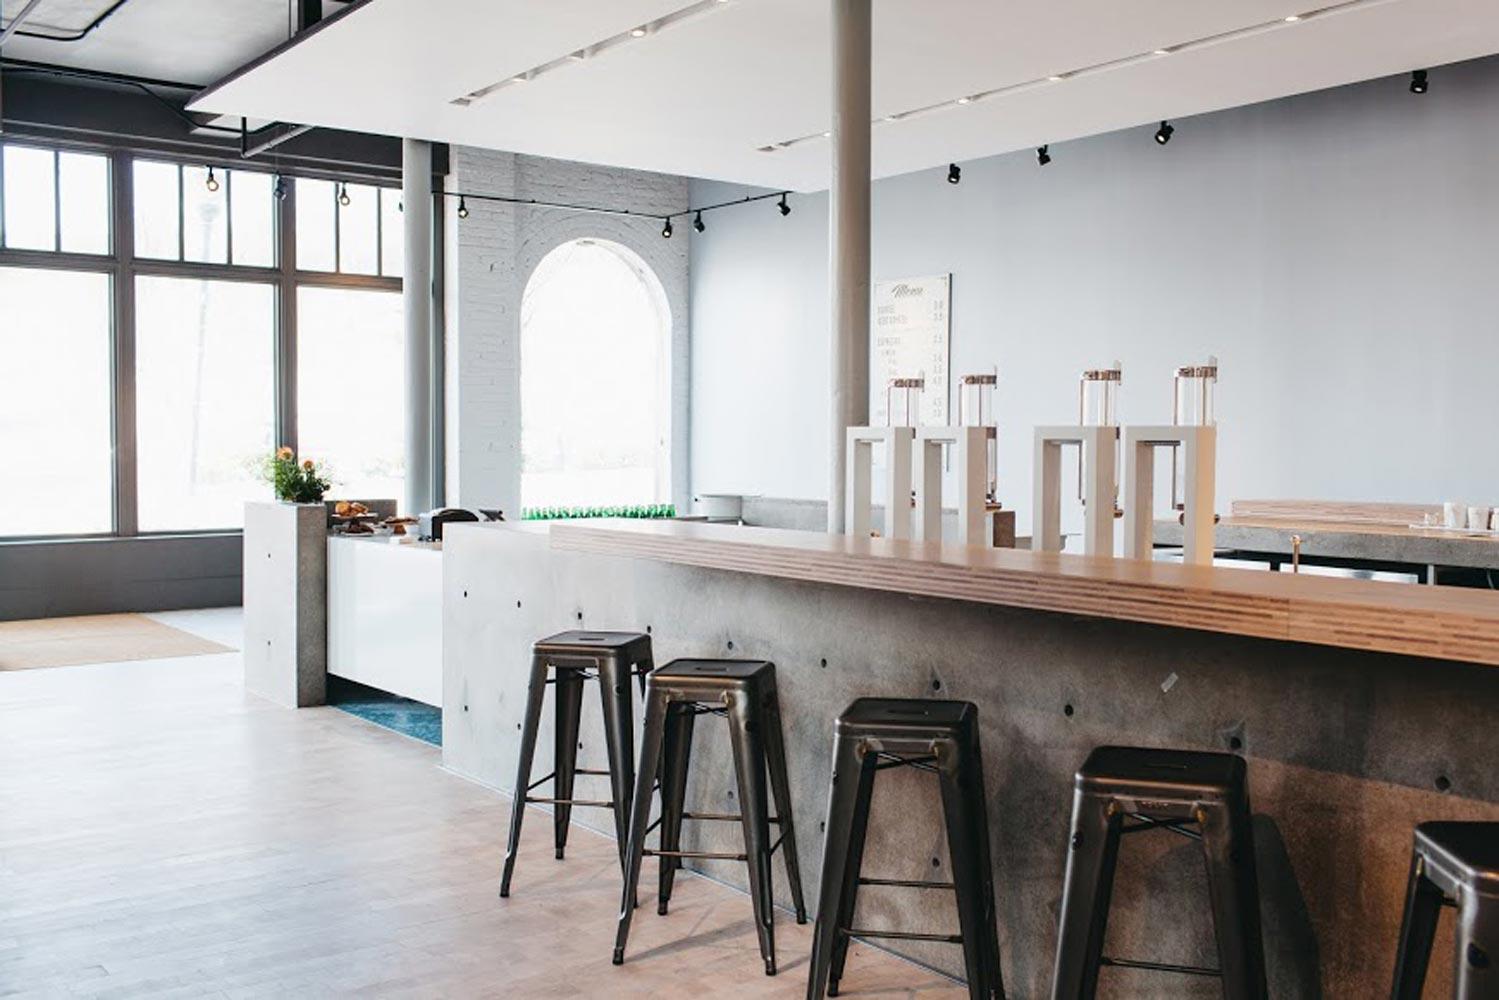 Revelator Chattanooga modern coffee shop inside view of bar area